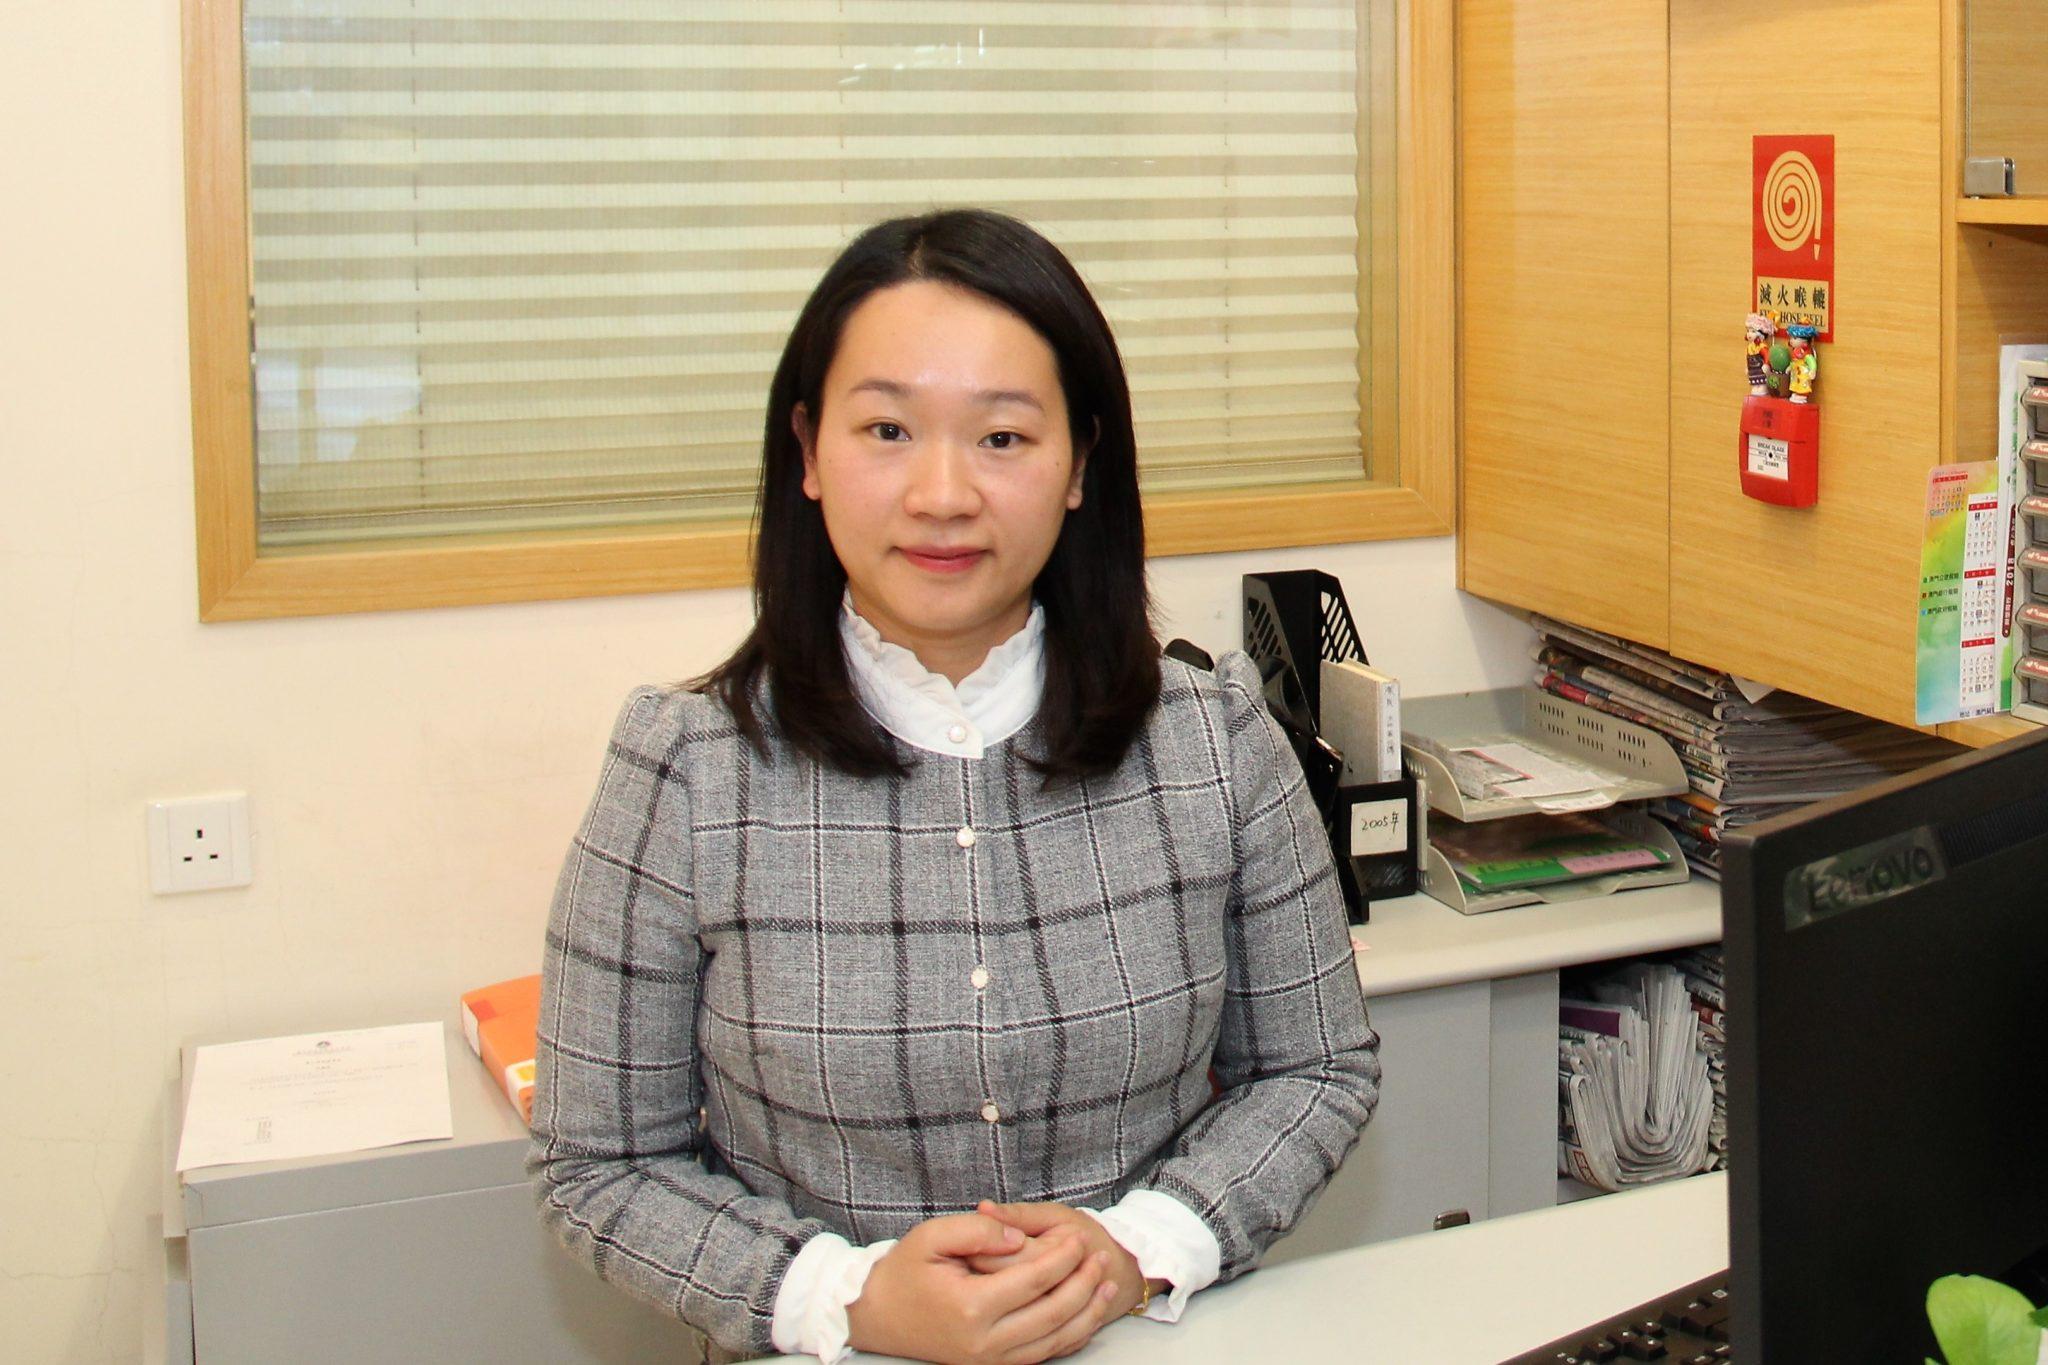 Deputada Wong Kit Cheng pede combate aos delitos ligados ao jogo